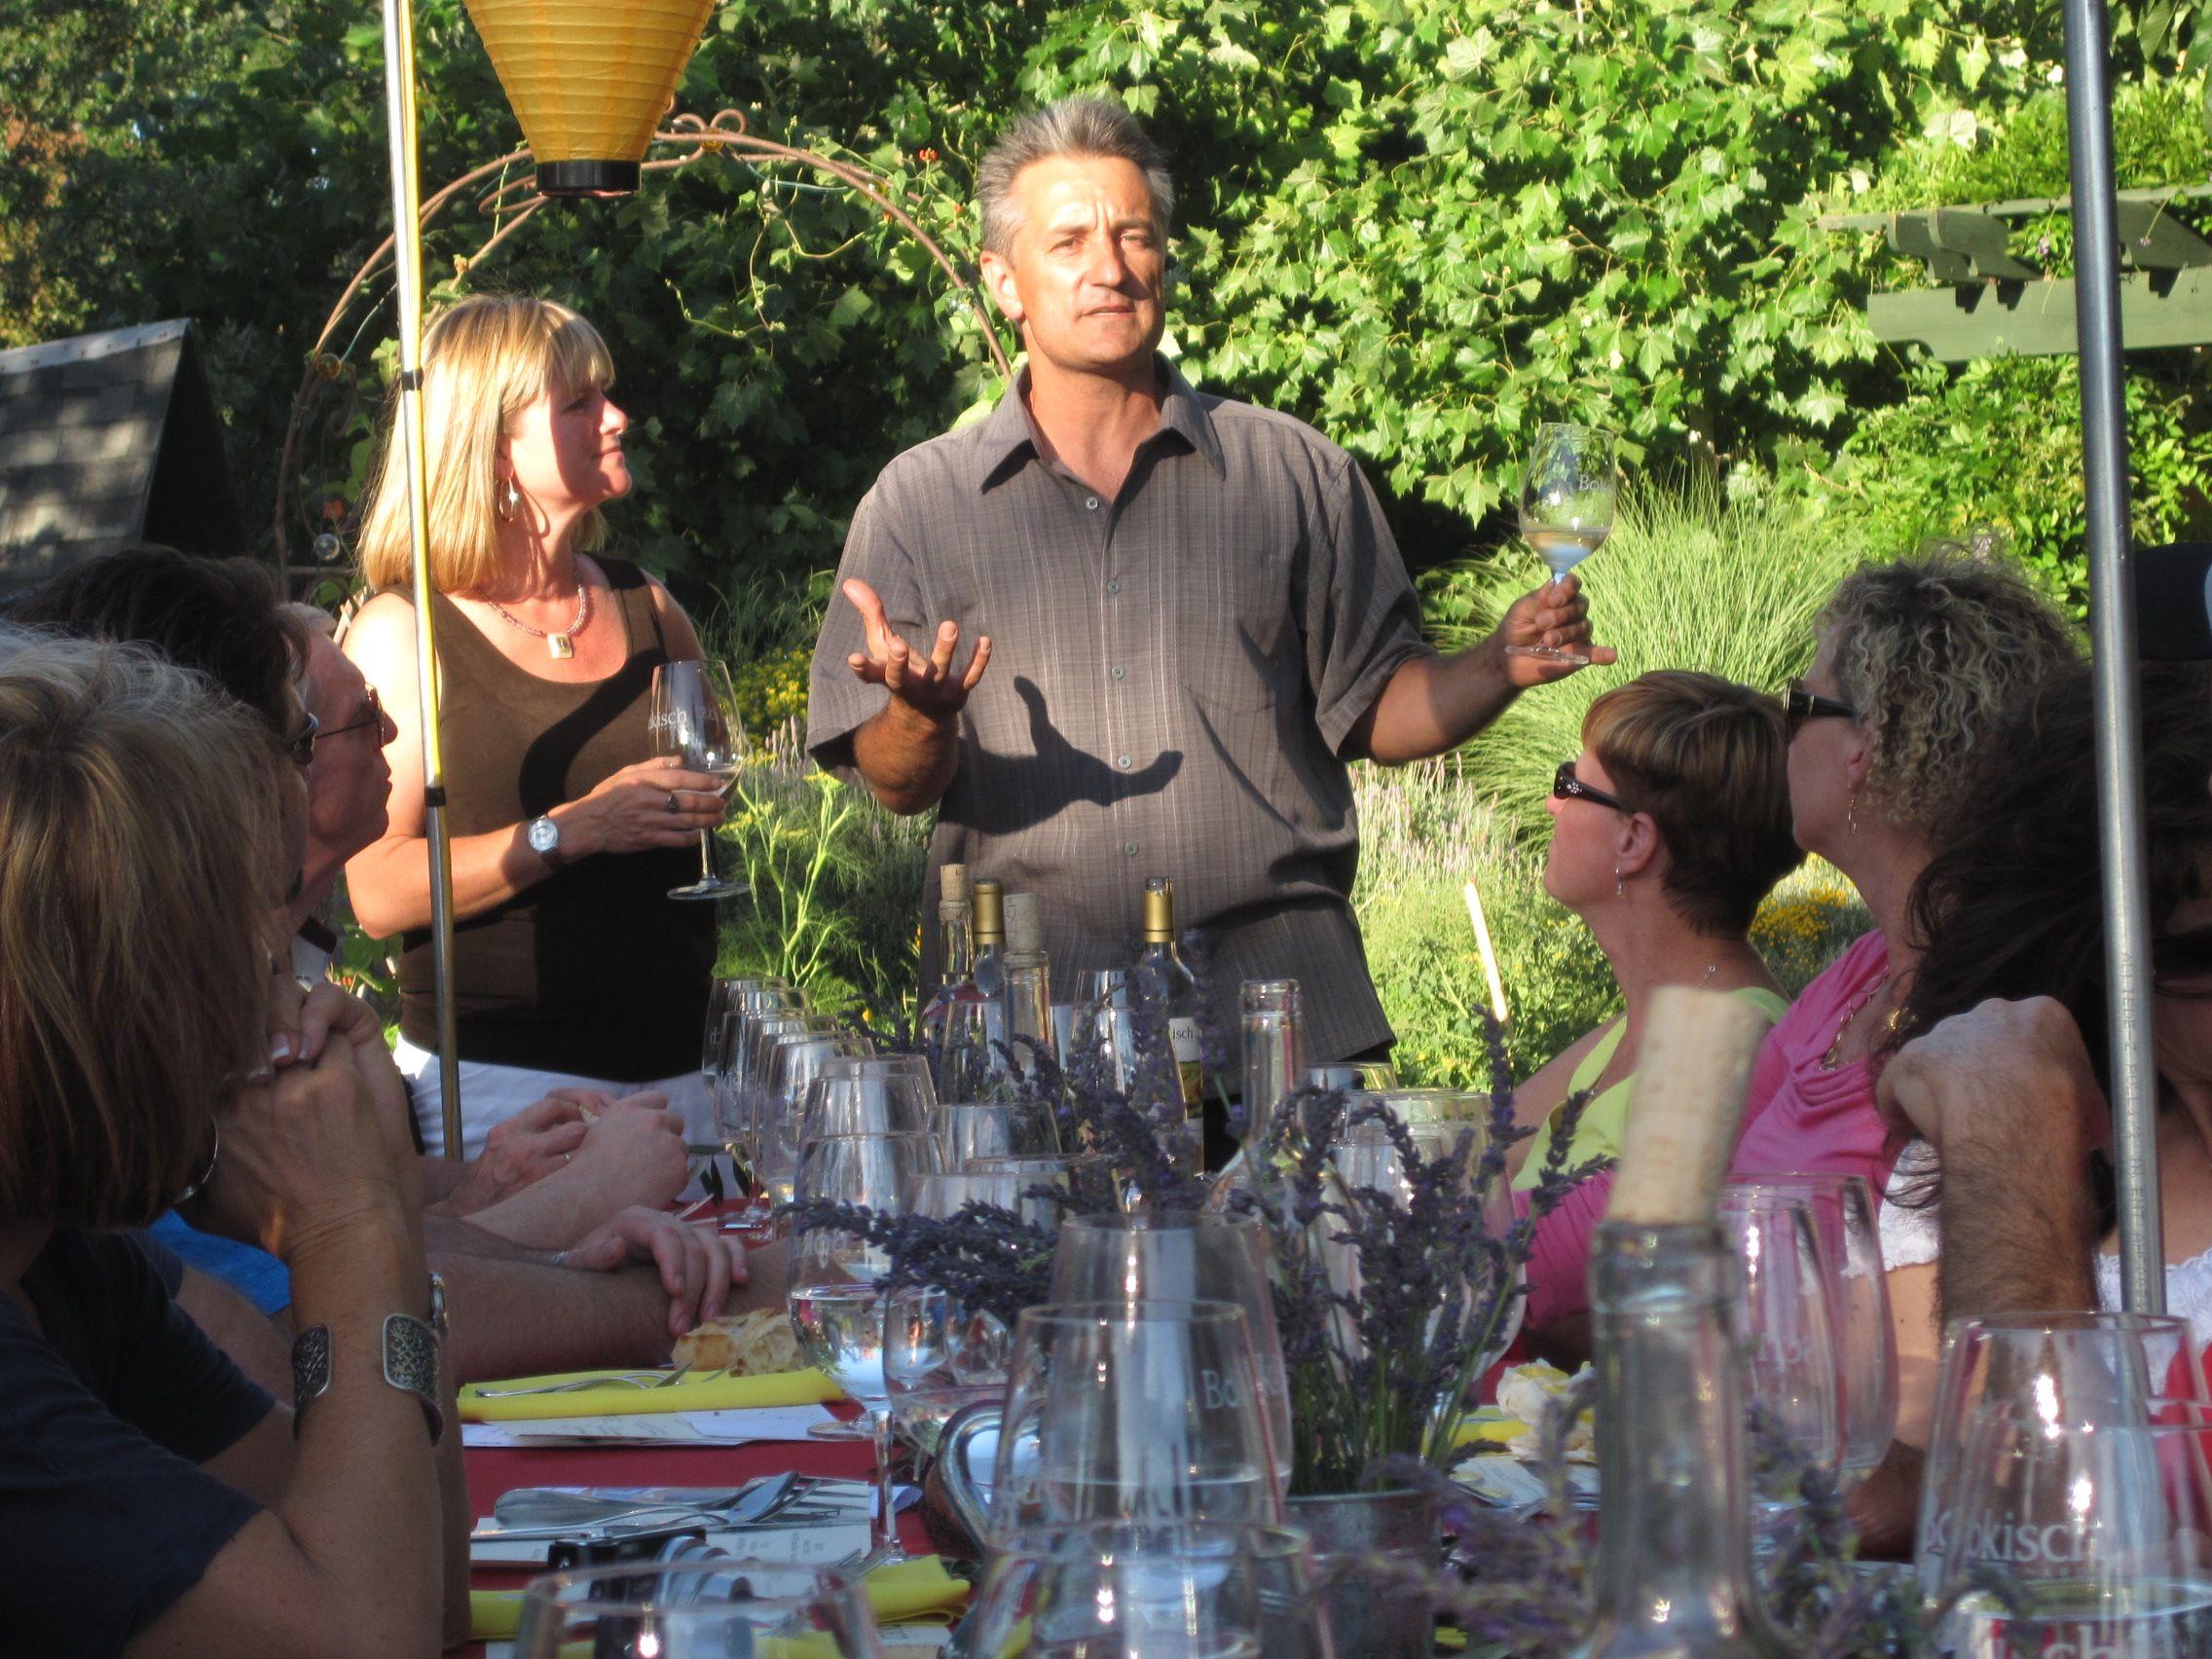 Liz and Markus Bokisch of Bokisch Vineyards hosting a dinner in the vineyards